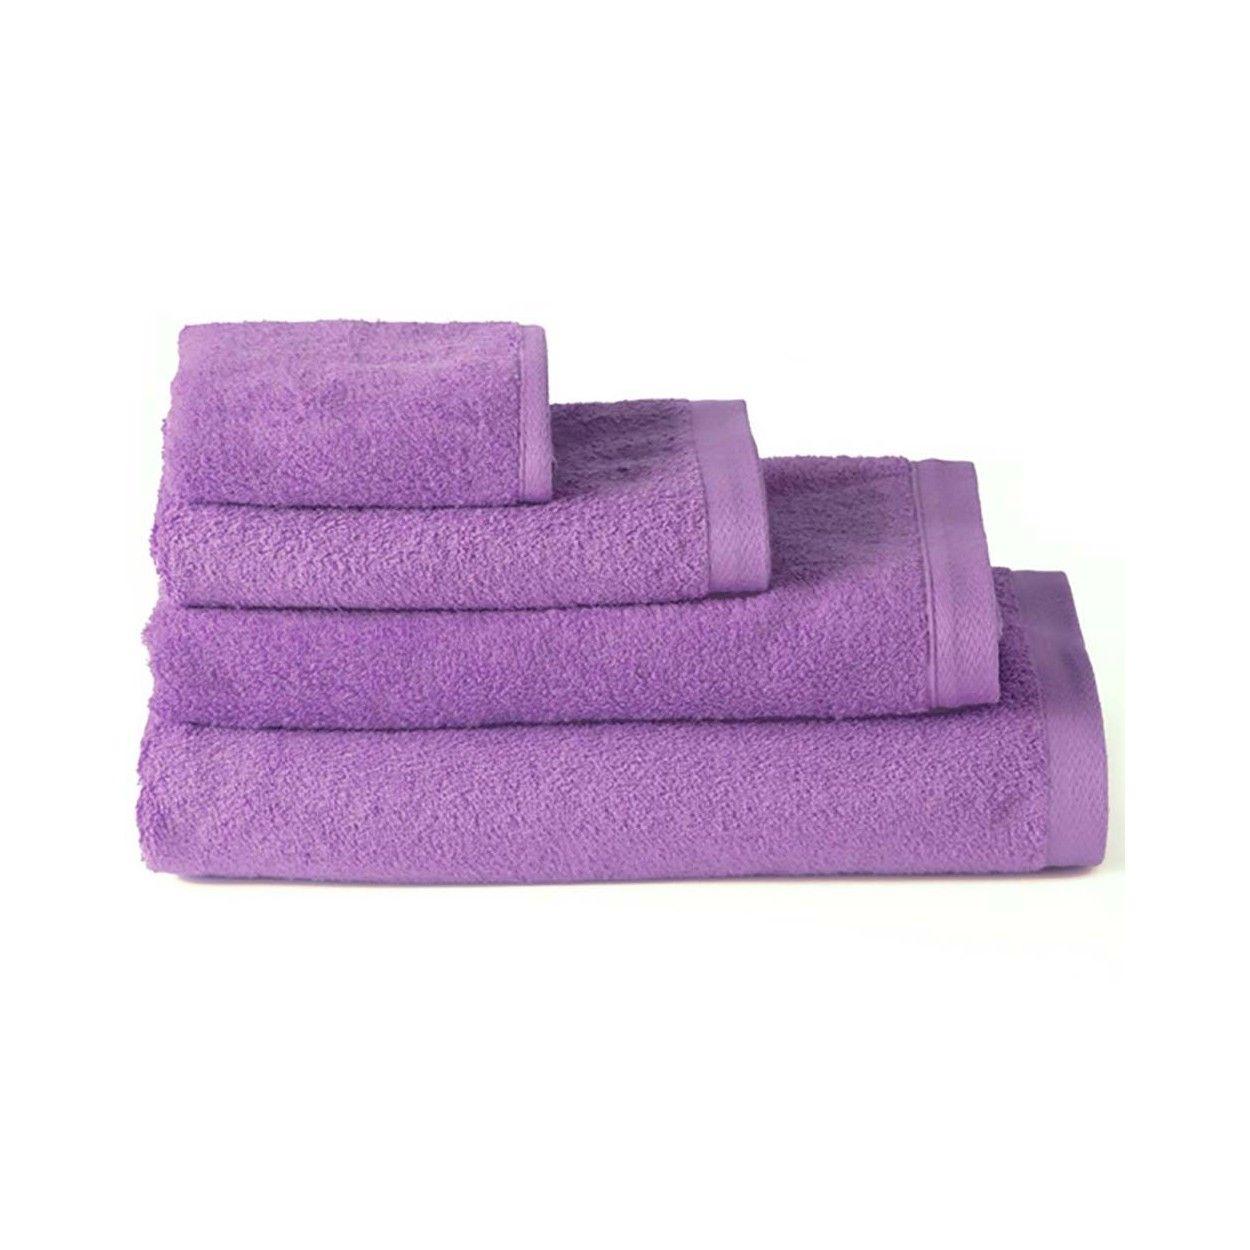 Toalla de ba o lavabo algod n lila 50x100 hogar y m s - Toallas para bano ...